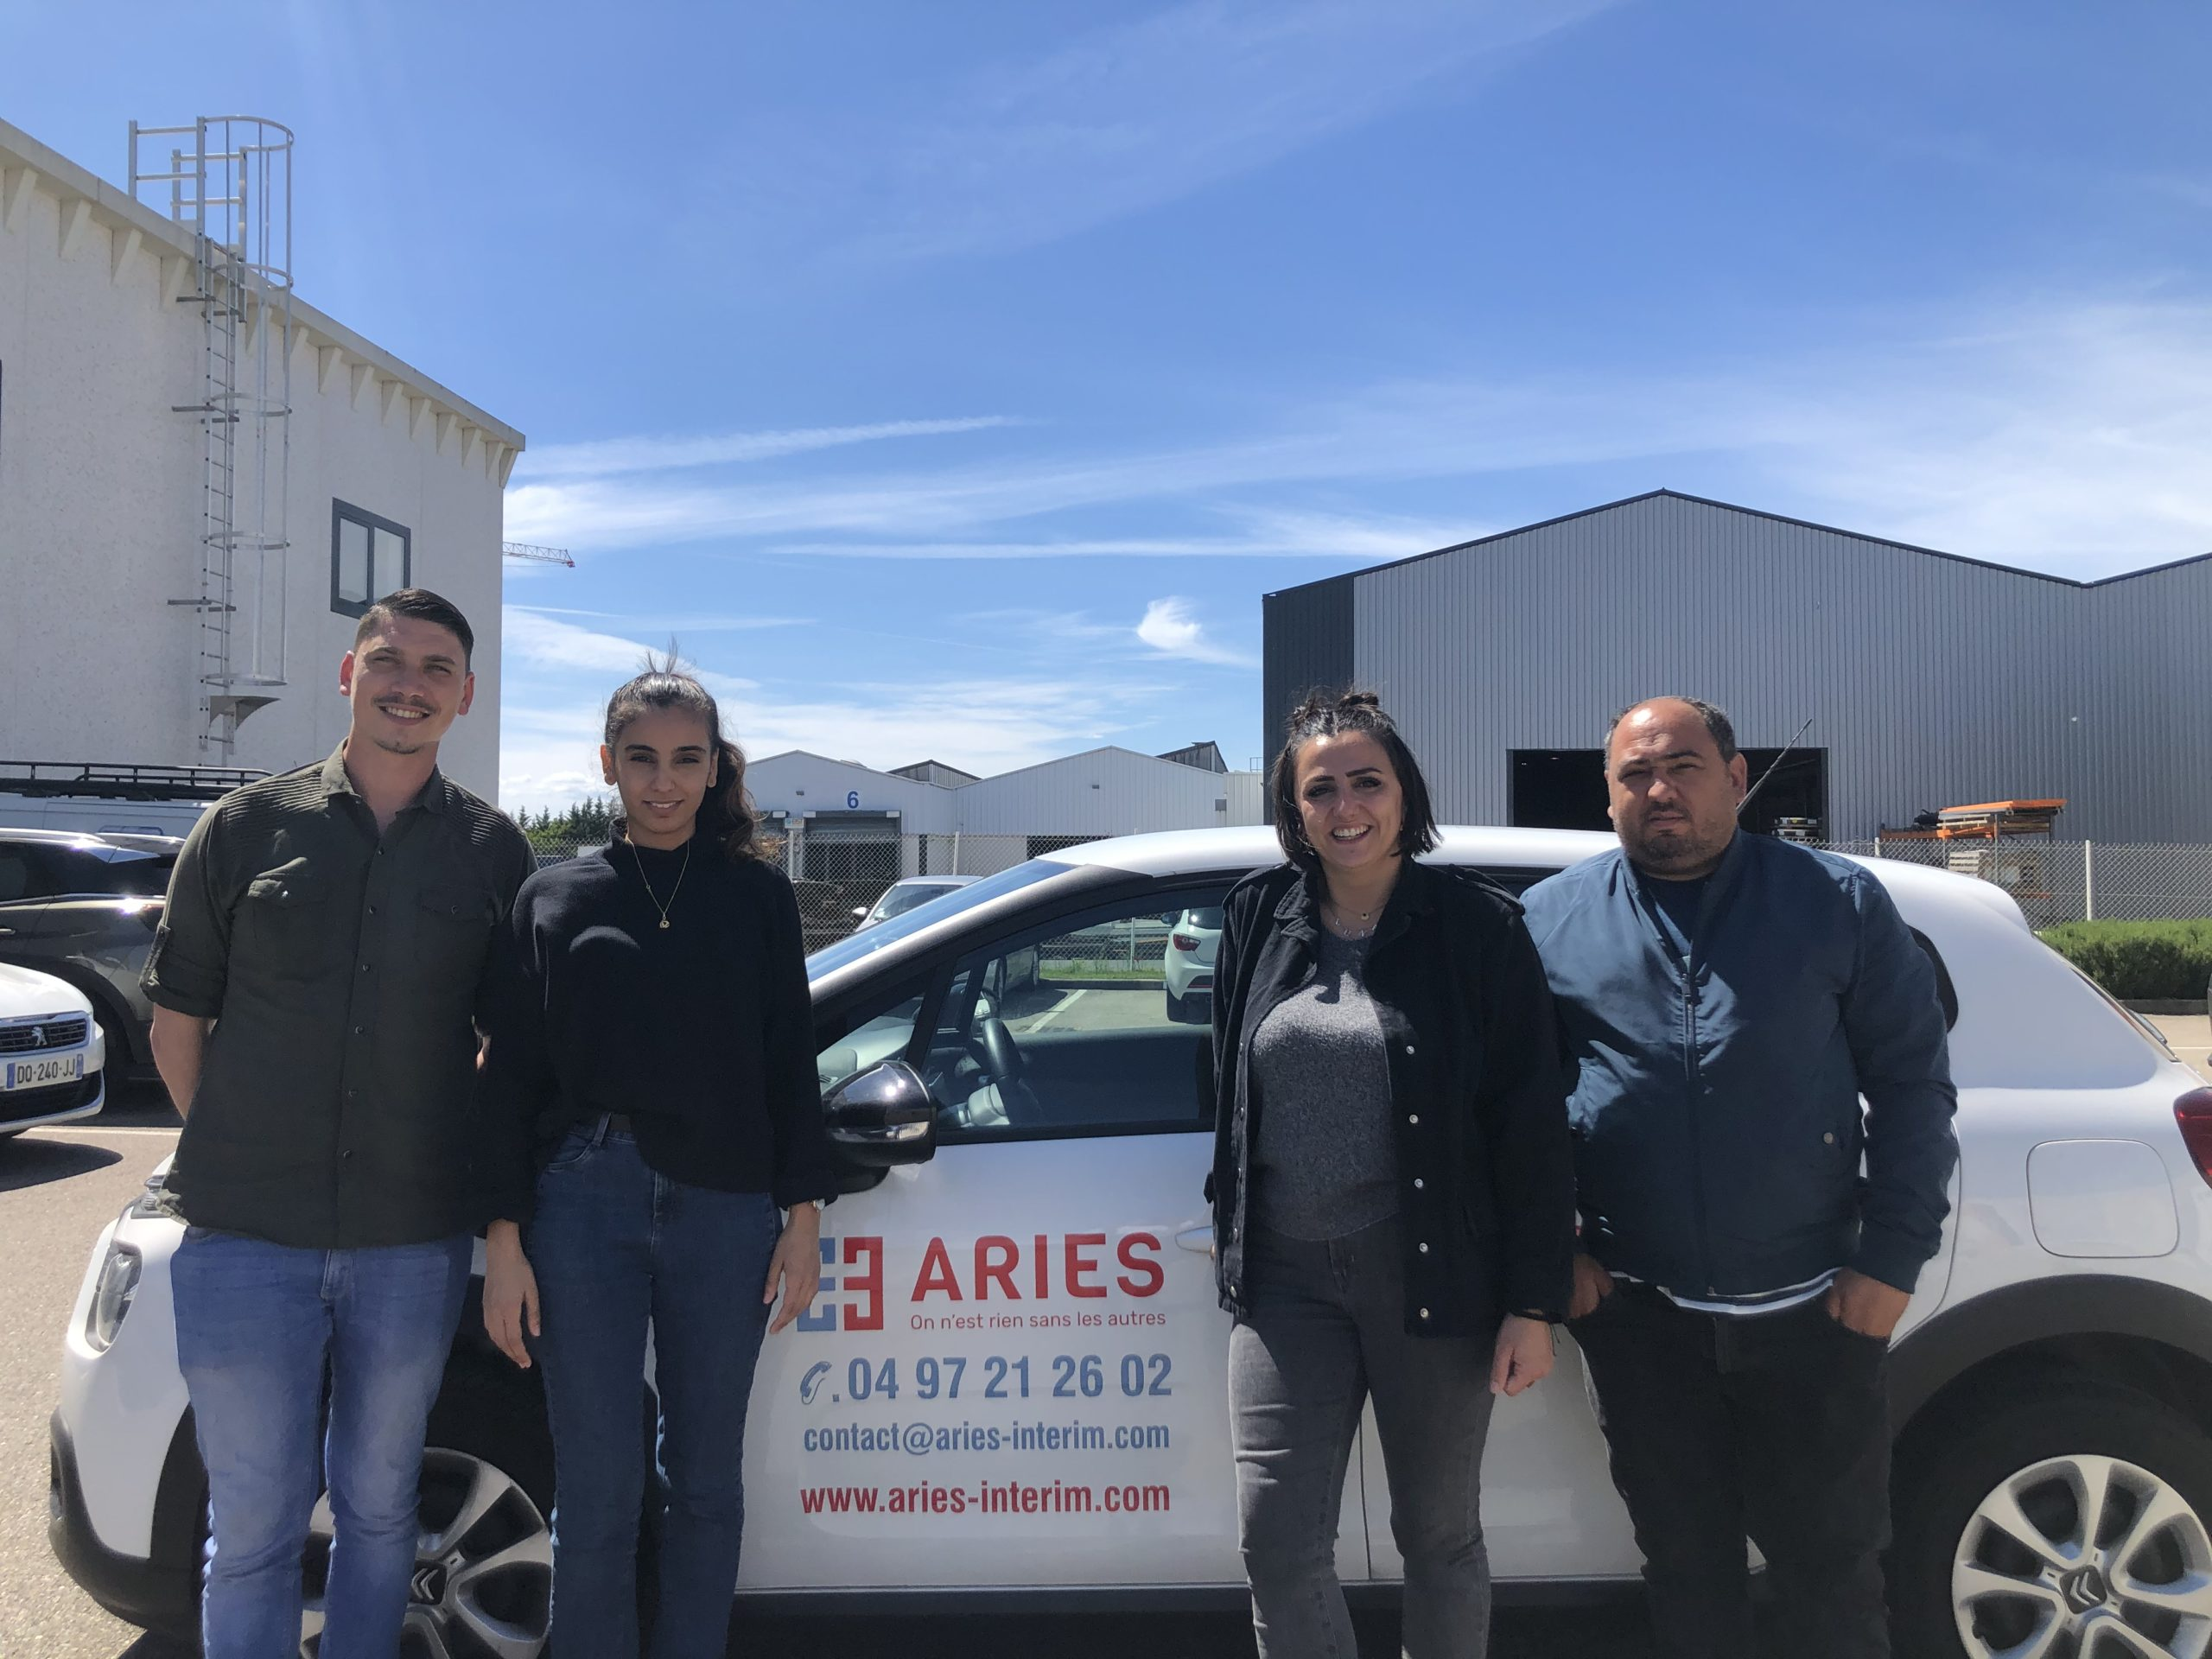 Aries interim Lyon - équipe